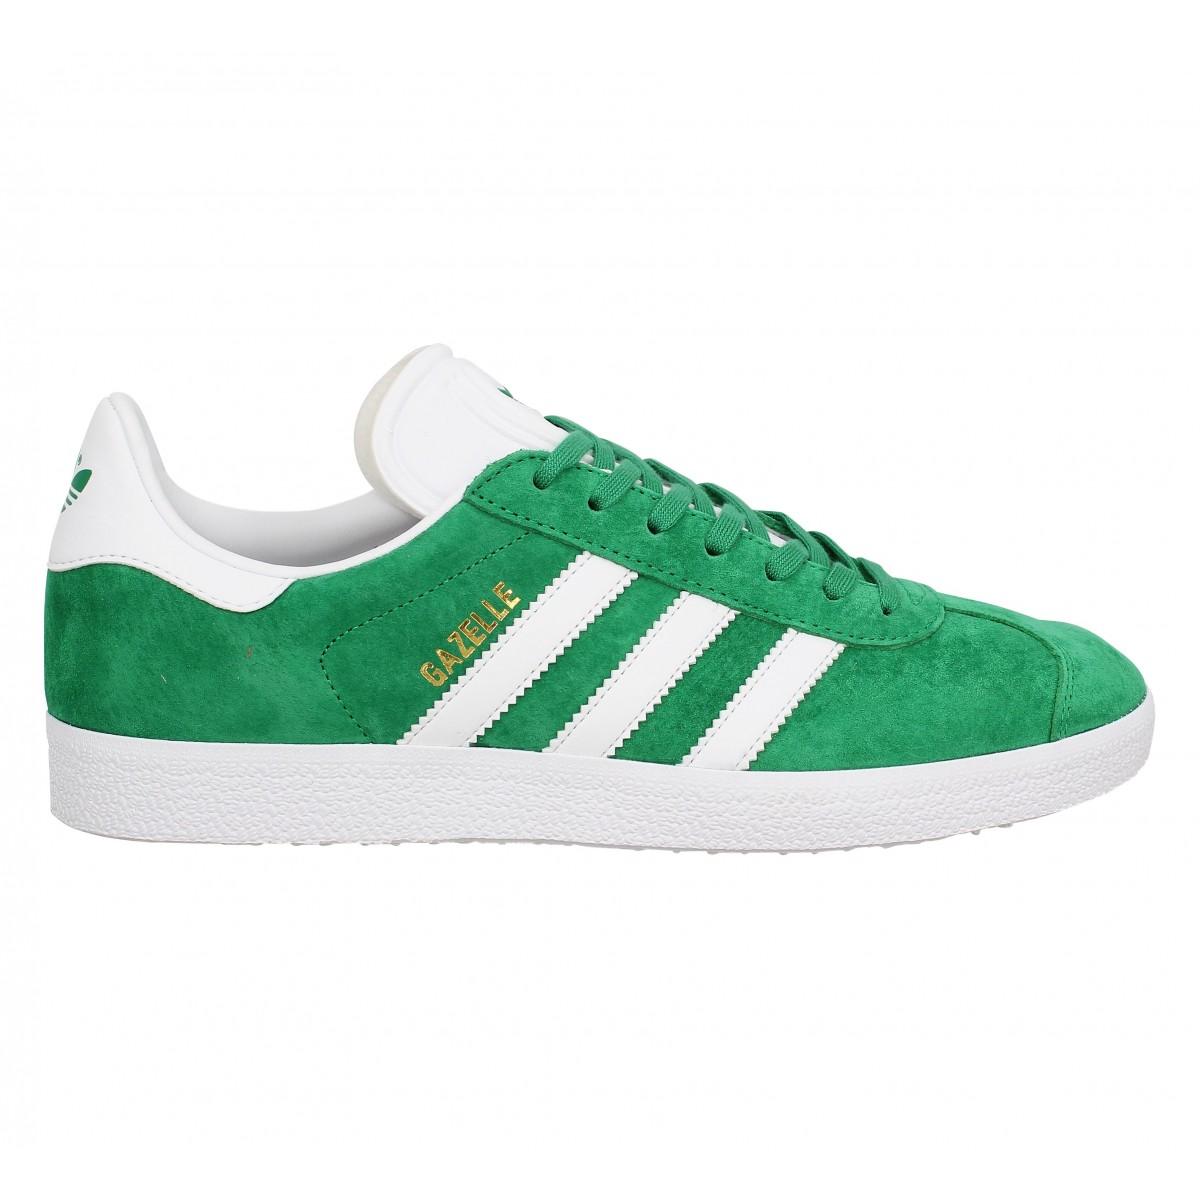 adidas gazelle vert homme pas cher